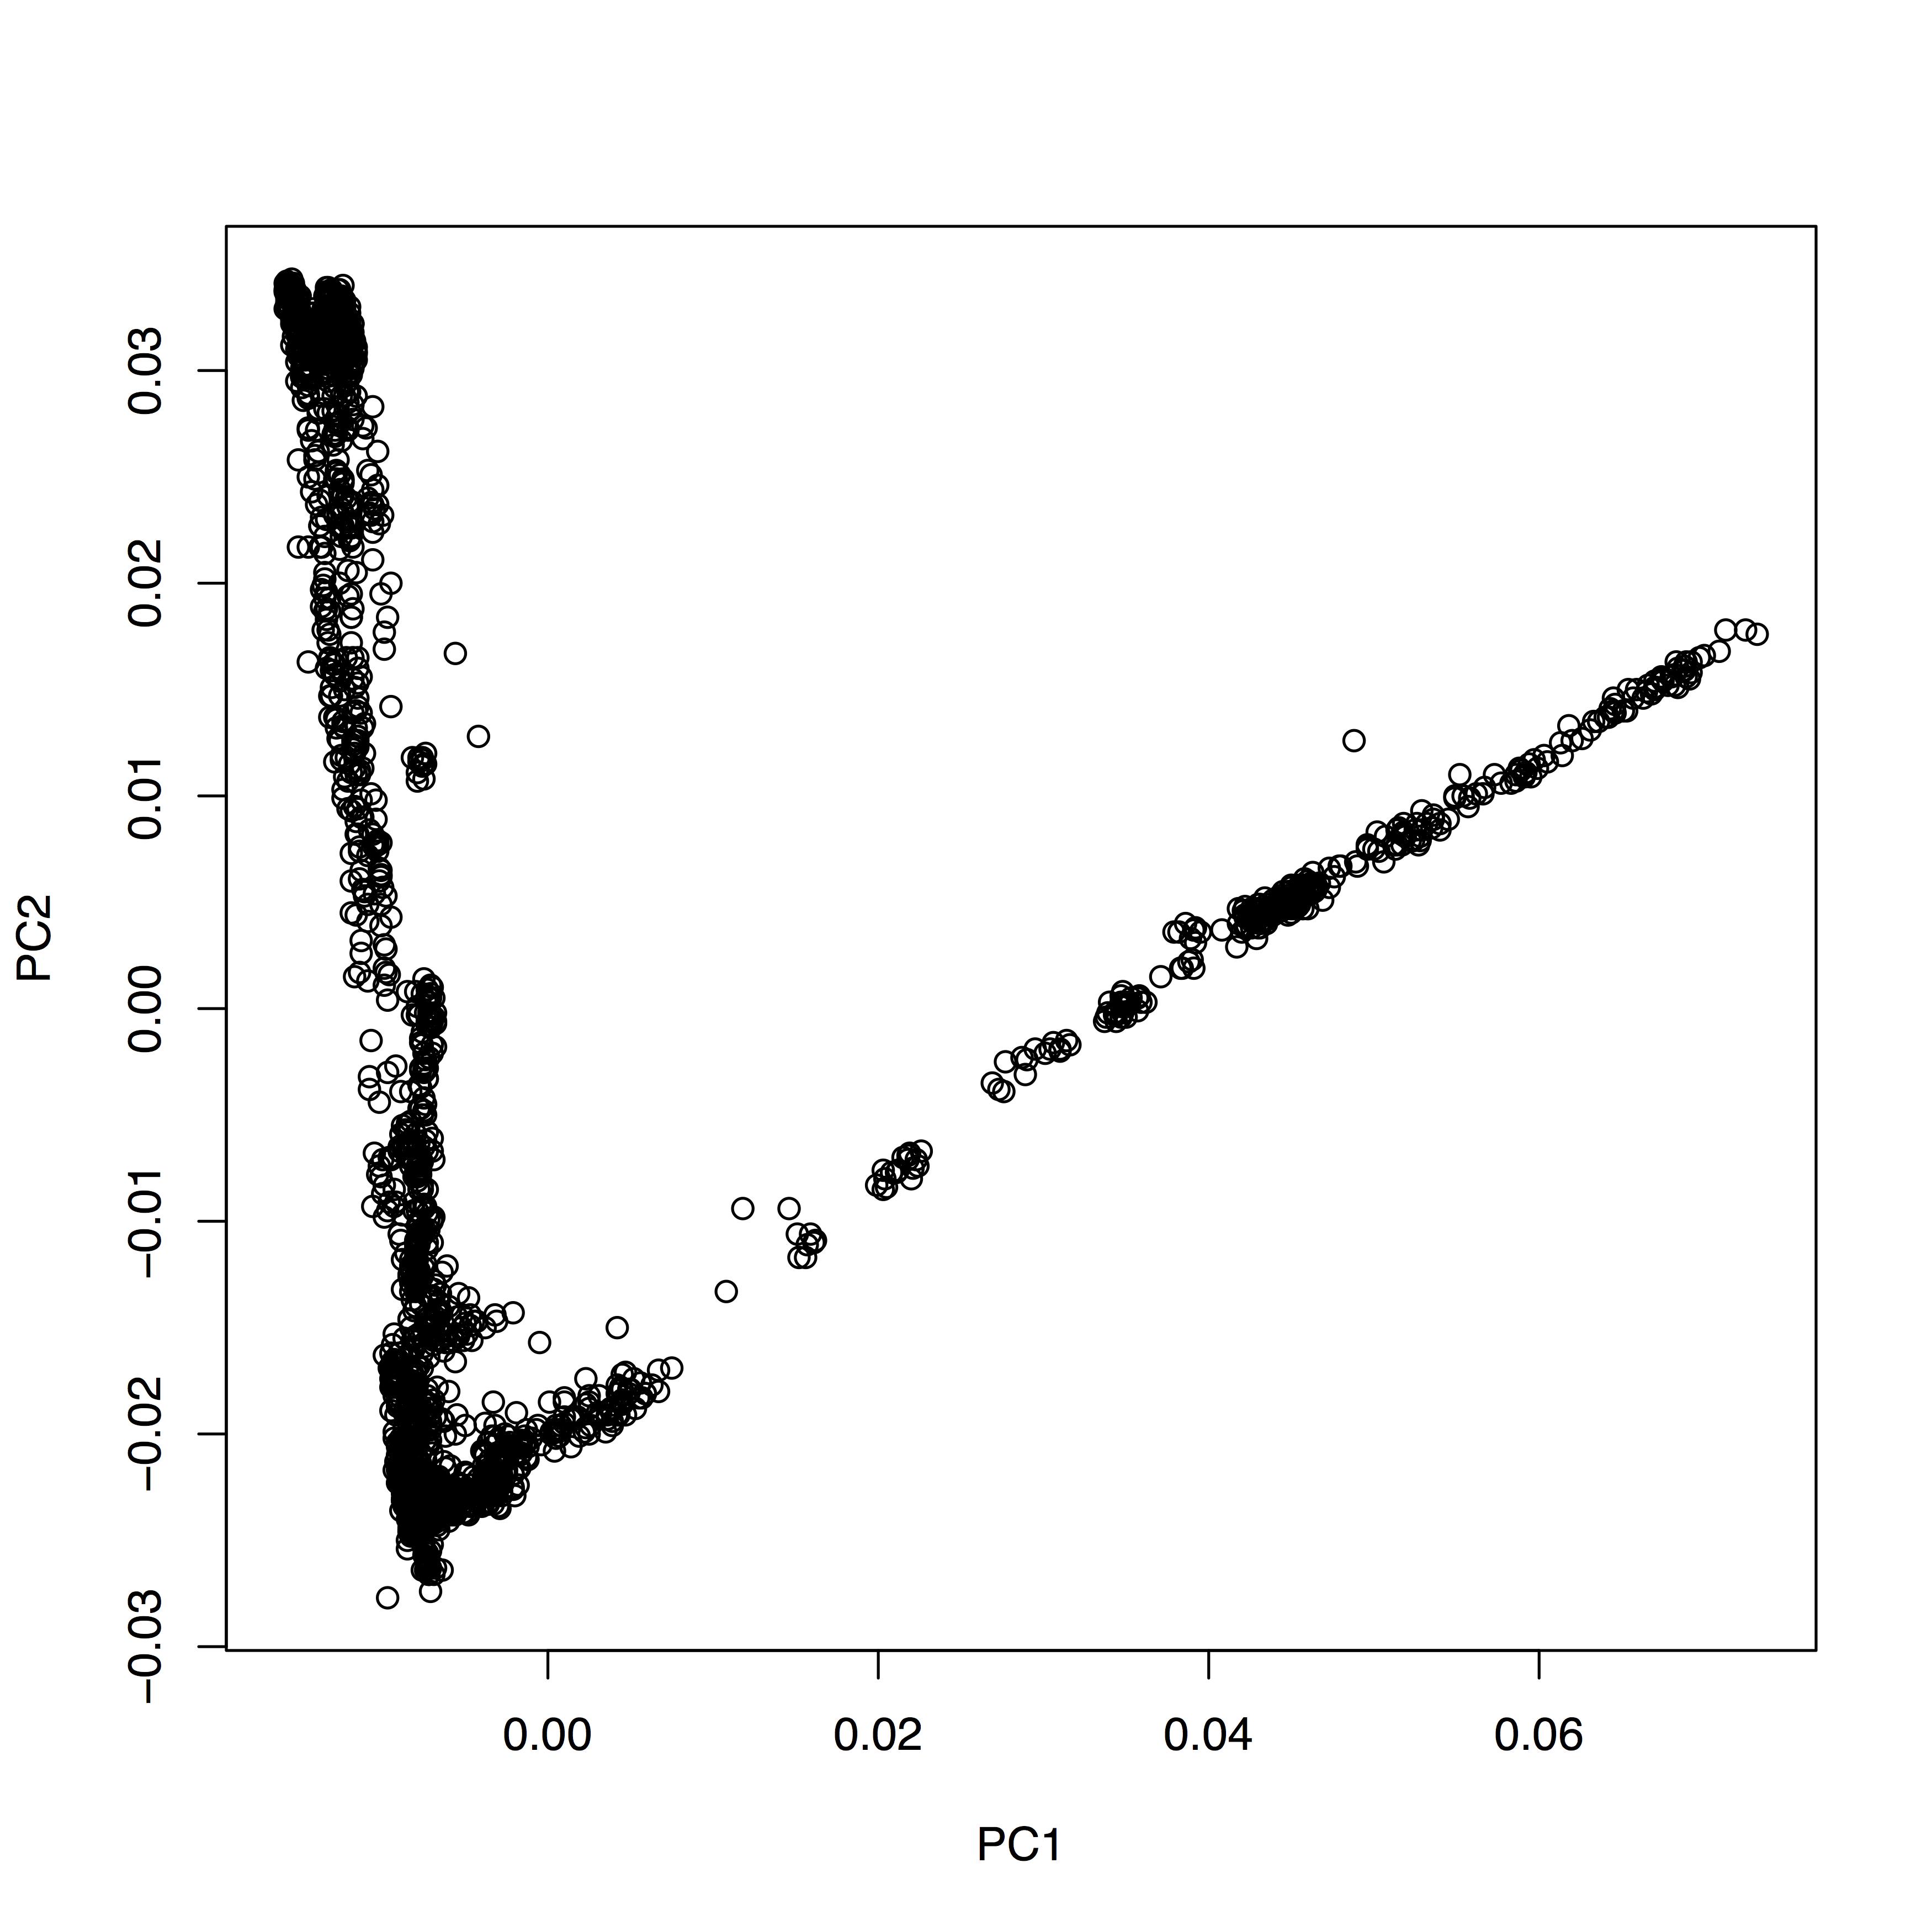 Principal Component Analysis — GAWorkshop 1 documentation